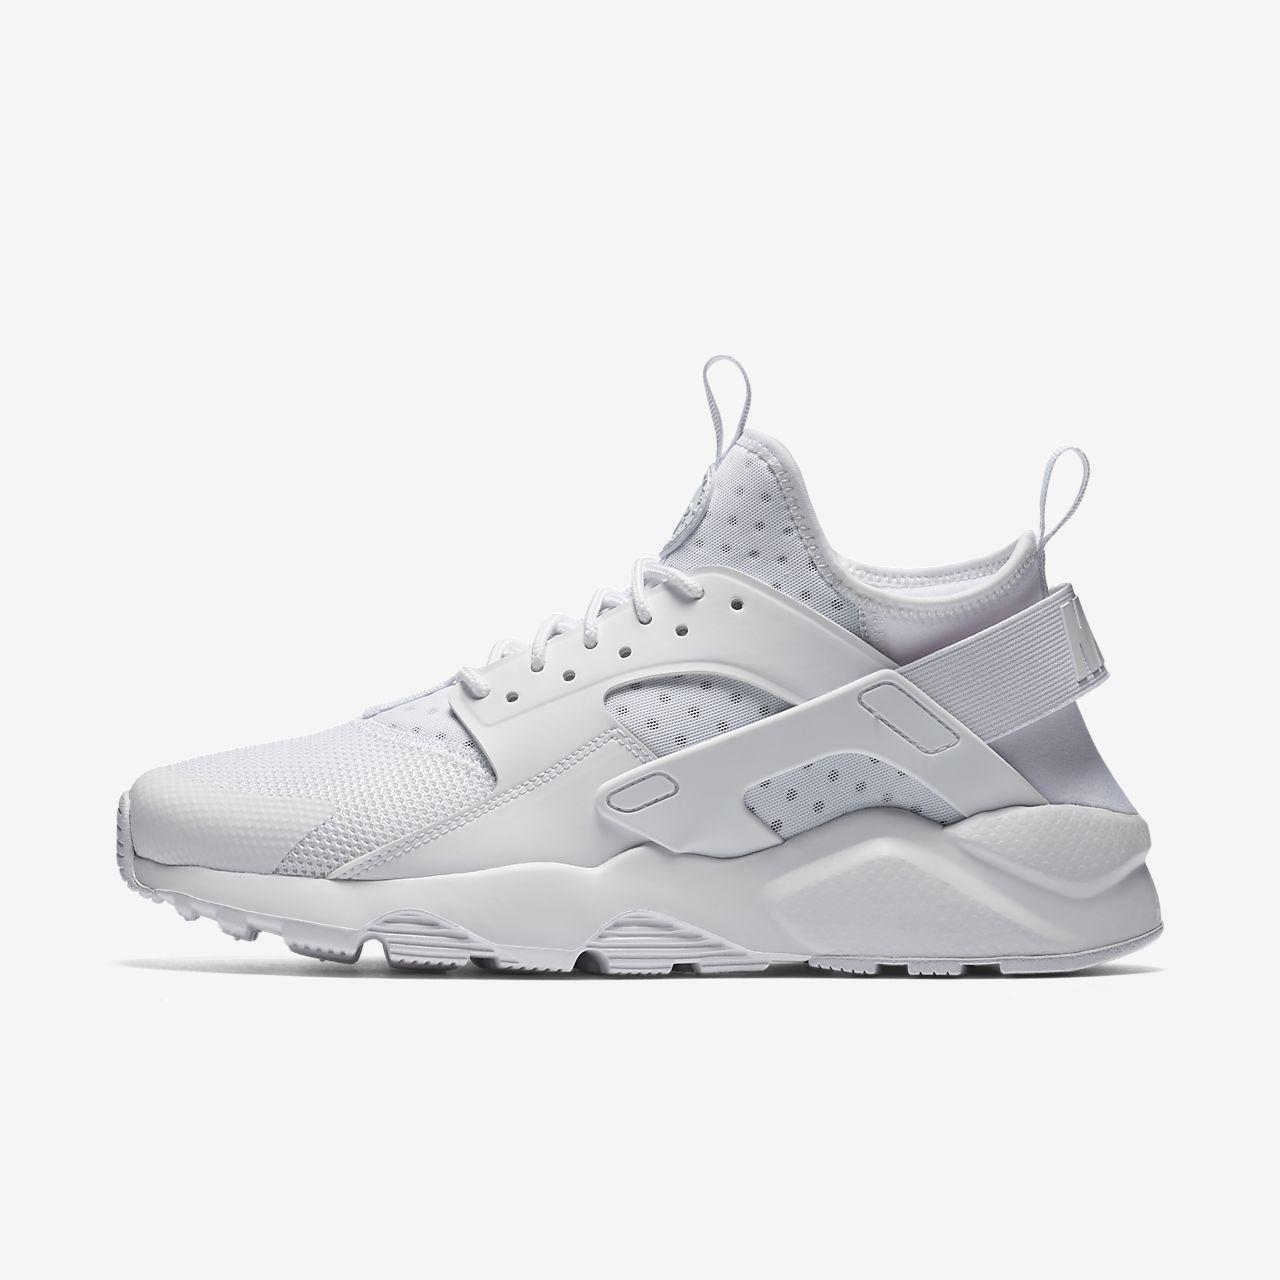 finest selection 4889f c22c3 ... Nike Air Huarache Ultra Zapatillas - Hombre